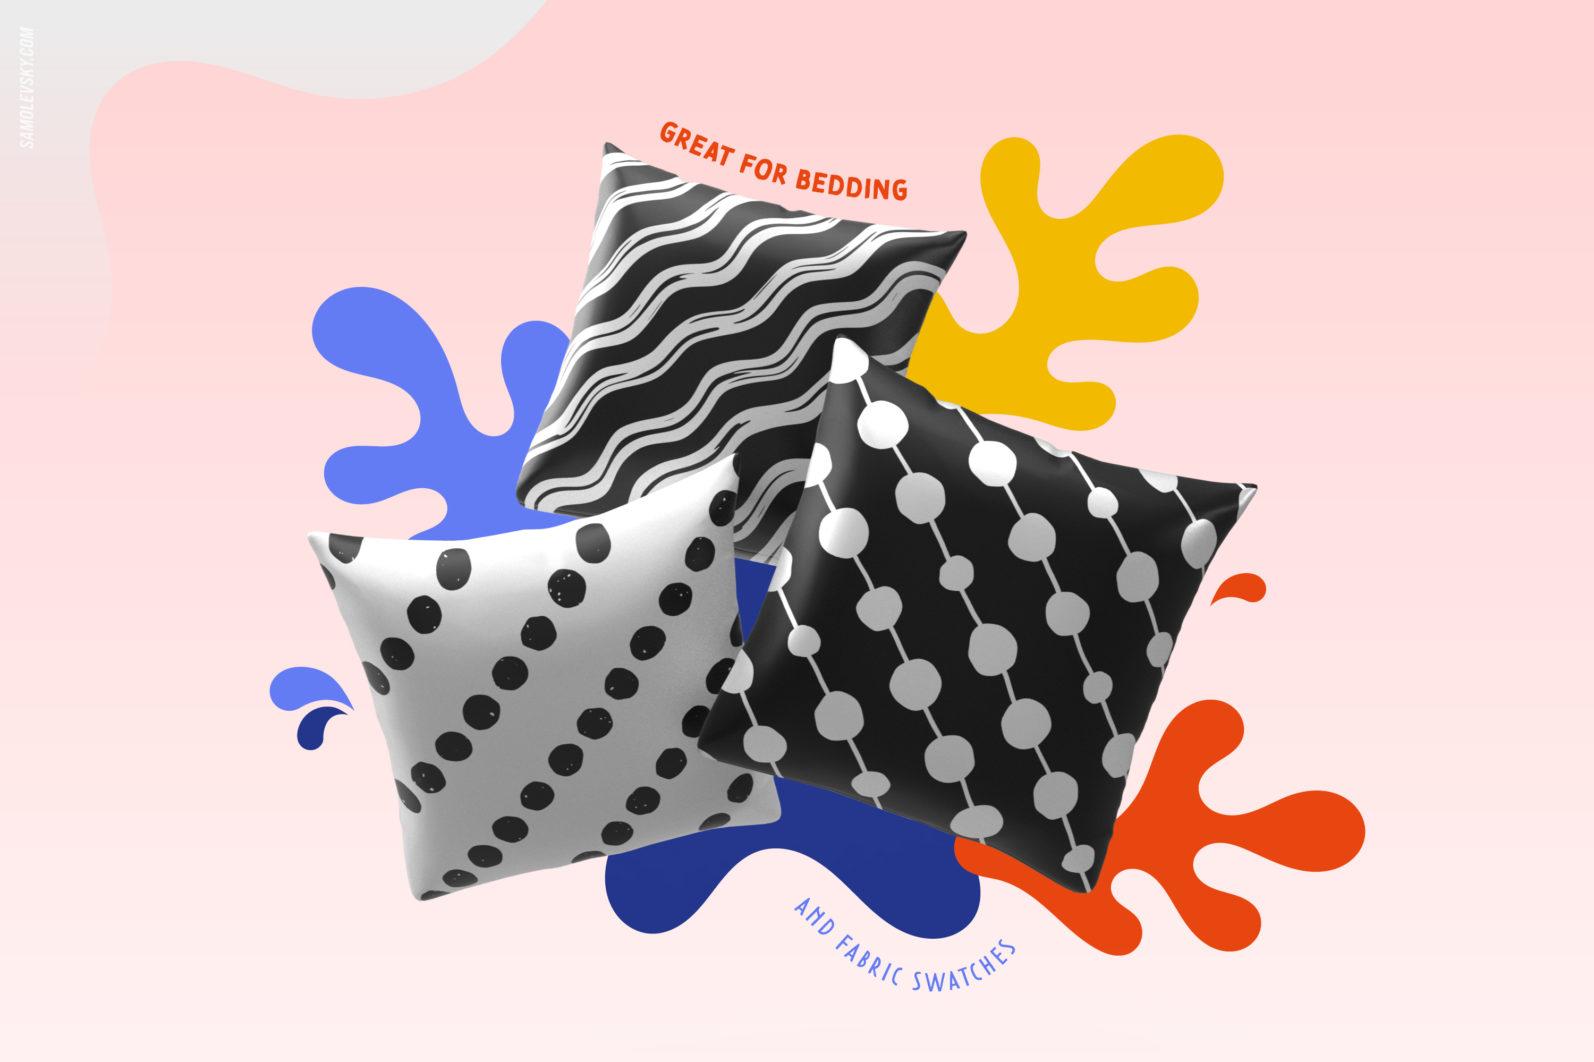 Handmade patterns bundle - 300 seamless patterns, brushes, and shapes - Samolevsky.com Handmade patterns bundle 04 scaled -